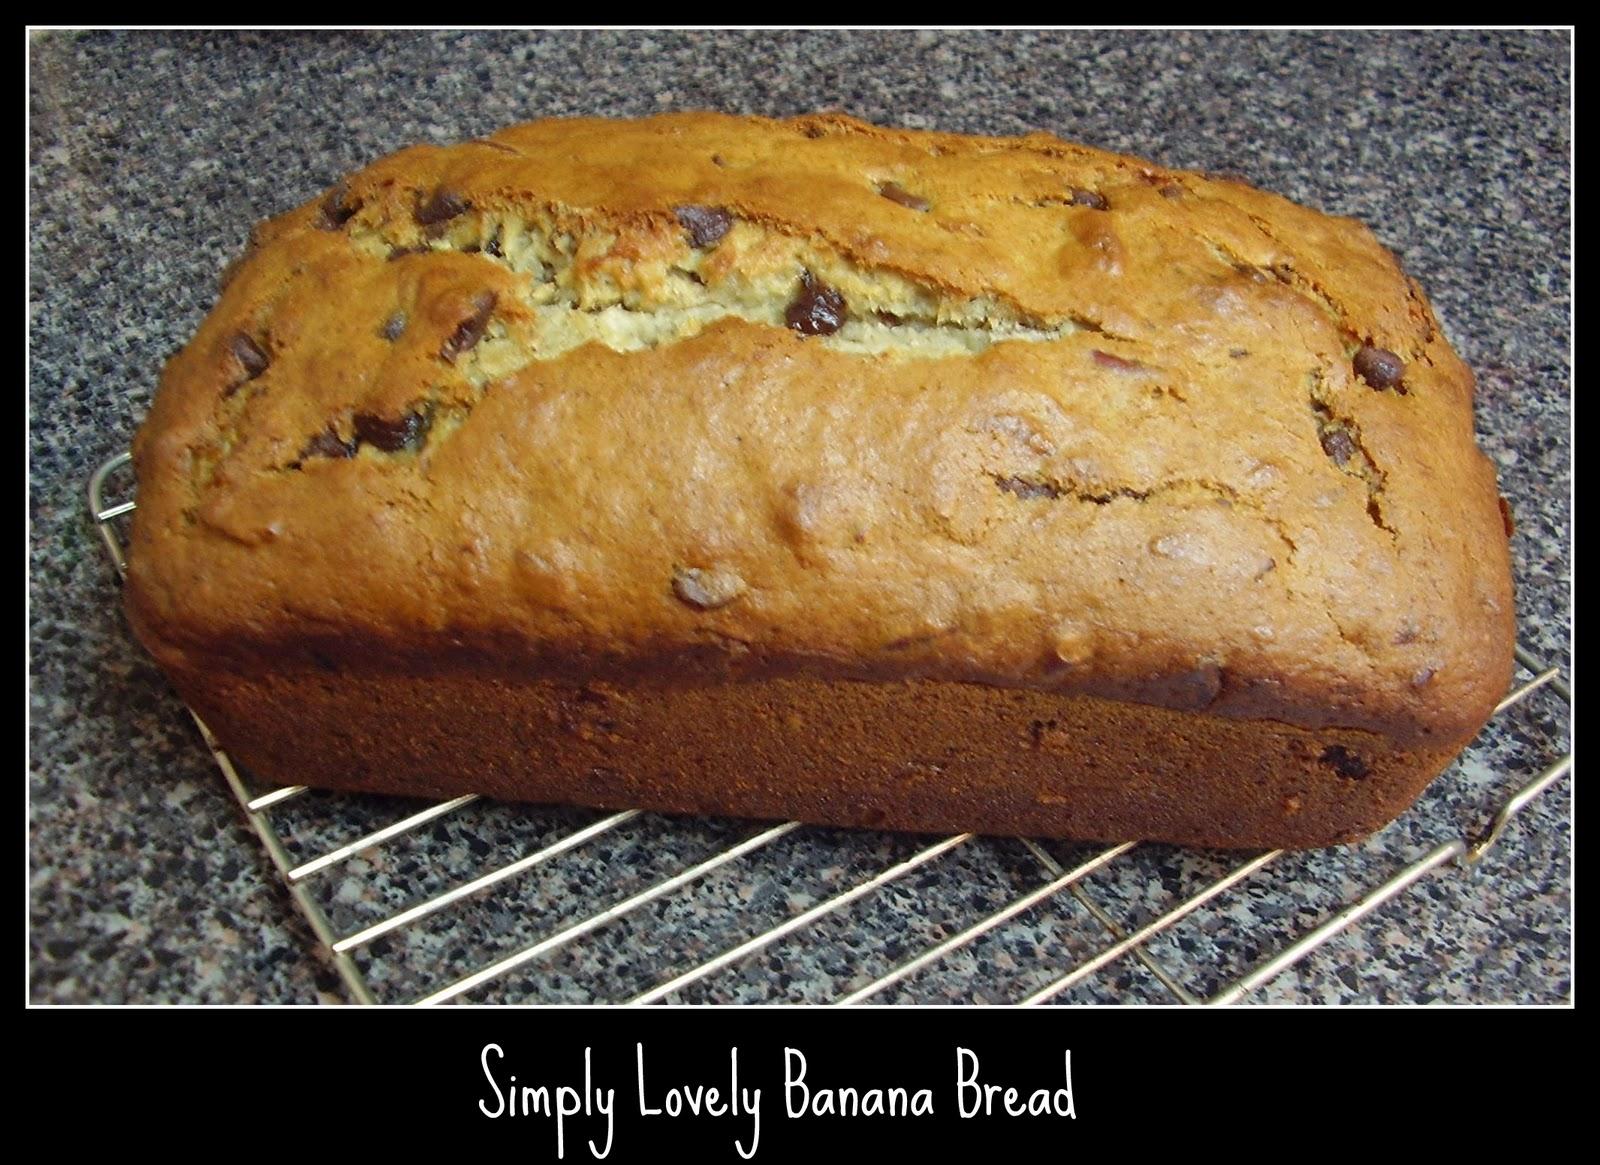 Better Homes And Gardens Banana Bread Recipe 28 Images Banana Bread Bananas And Breads On